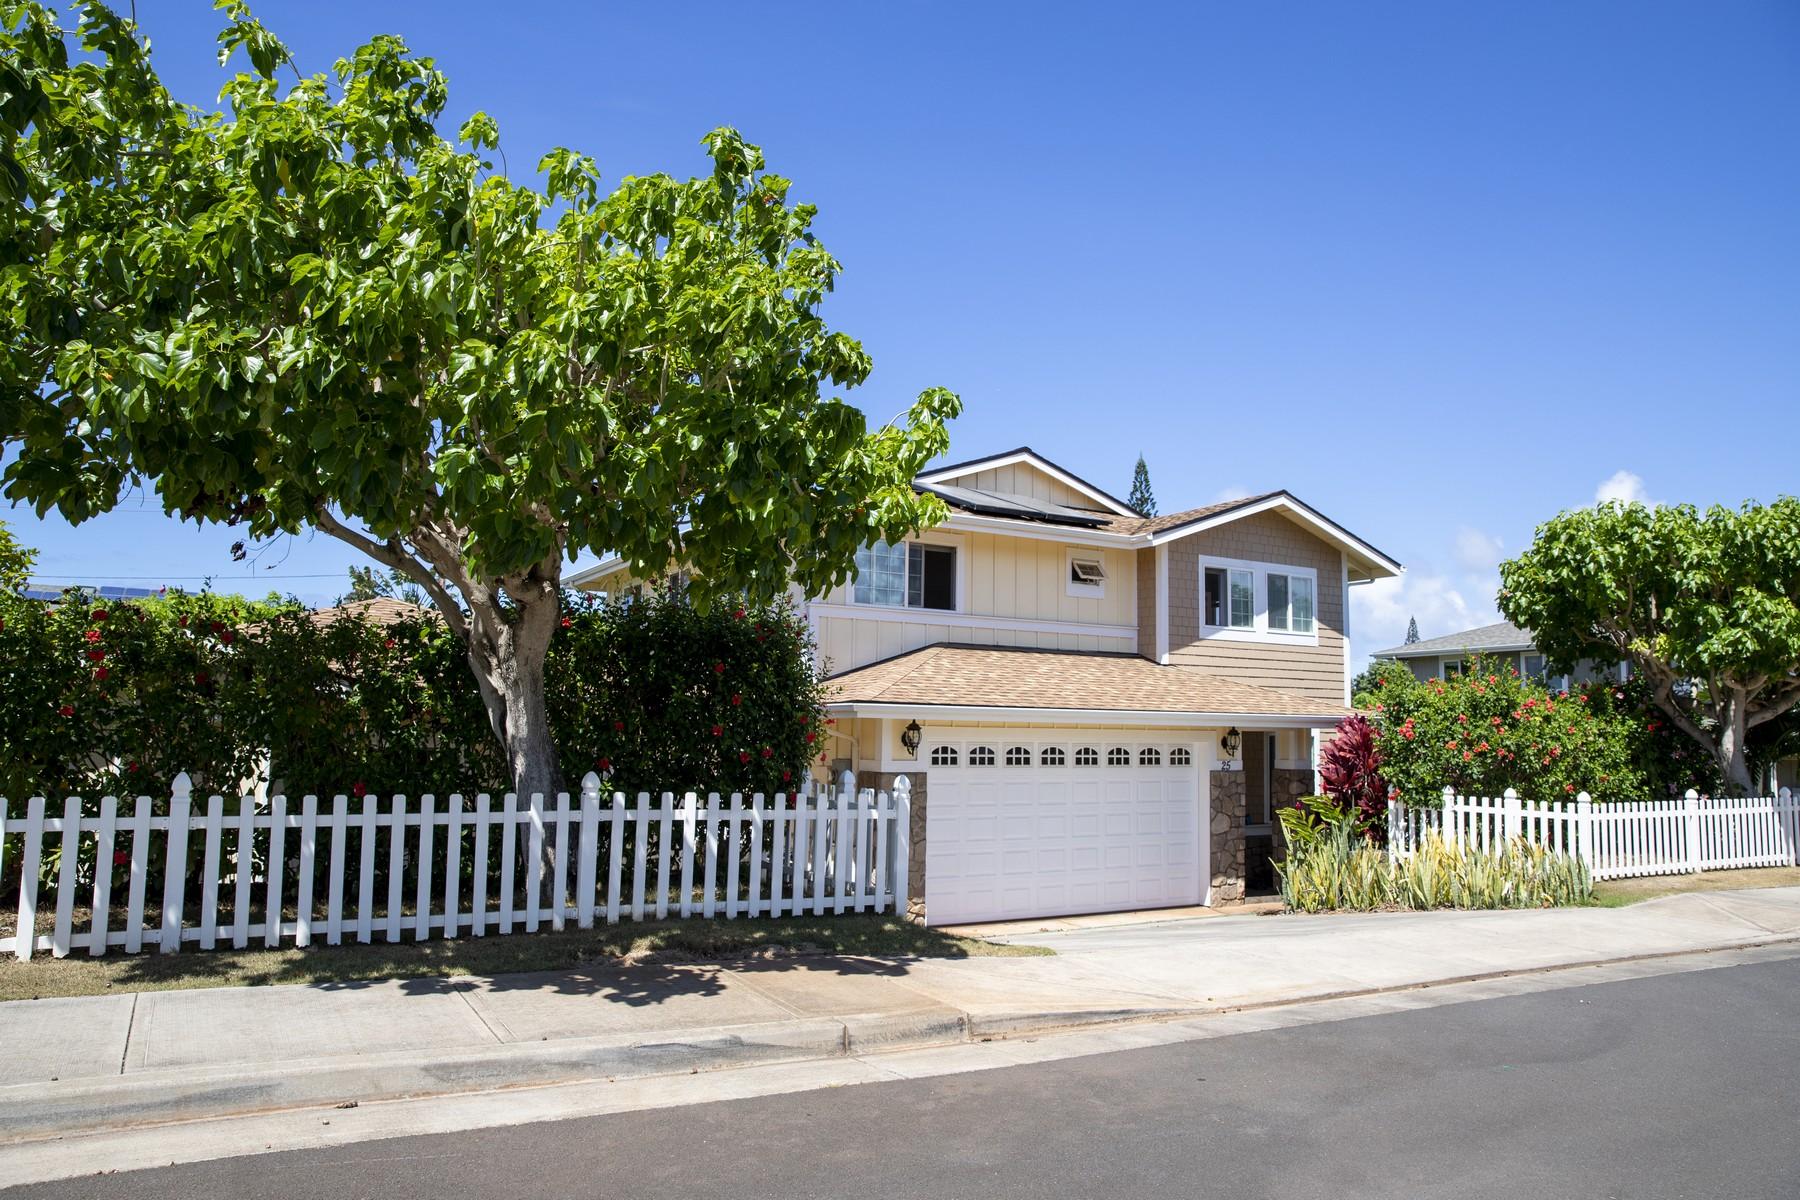 Single Family Homes για την Πώληση στο 25 Kili Nahe Street, Napili, Χαβαη 96761 Ηνωμένες Πολιτείες